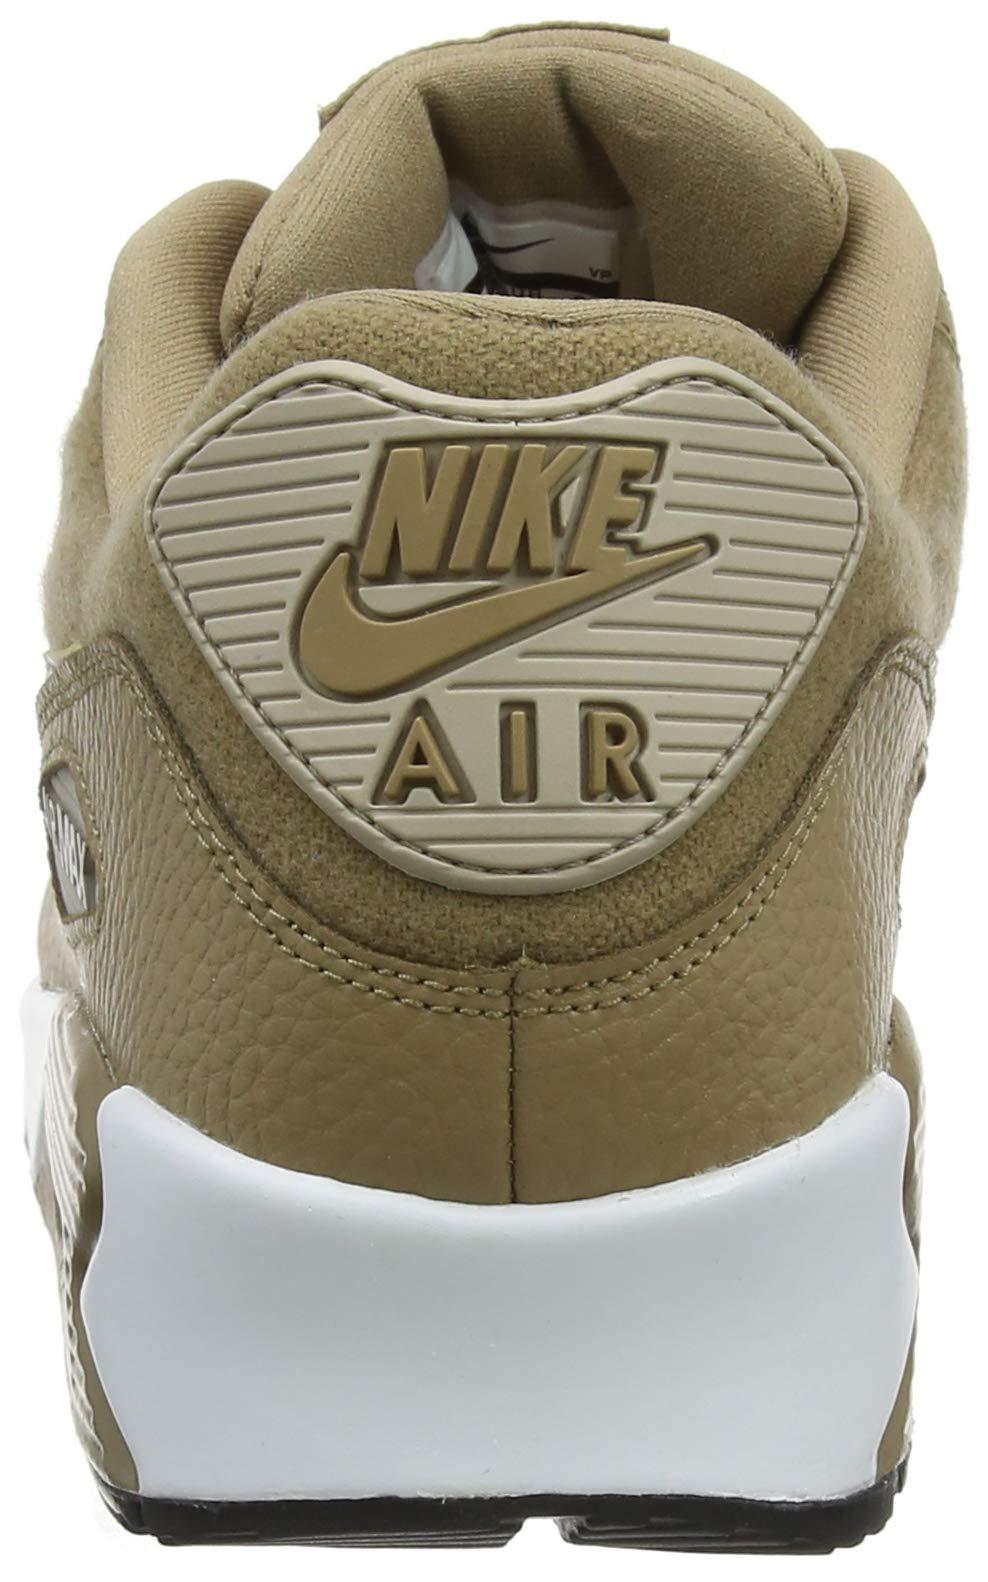 Nike Women's WMNS Air Max 90 Prem Fitness Shoes